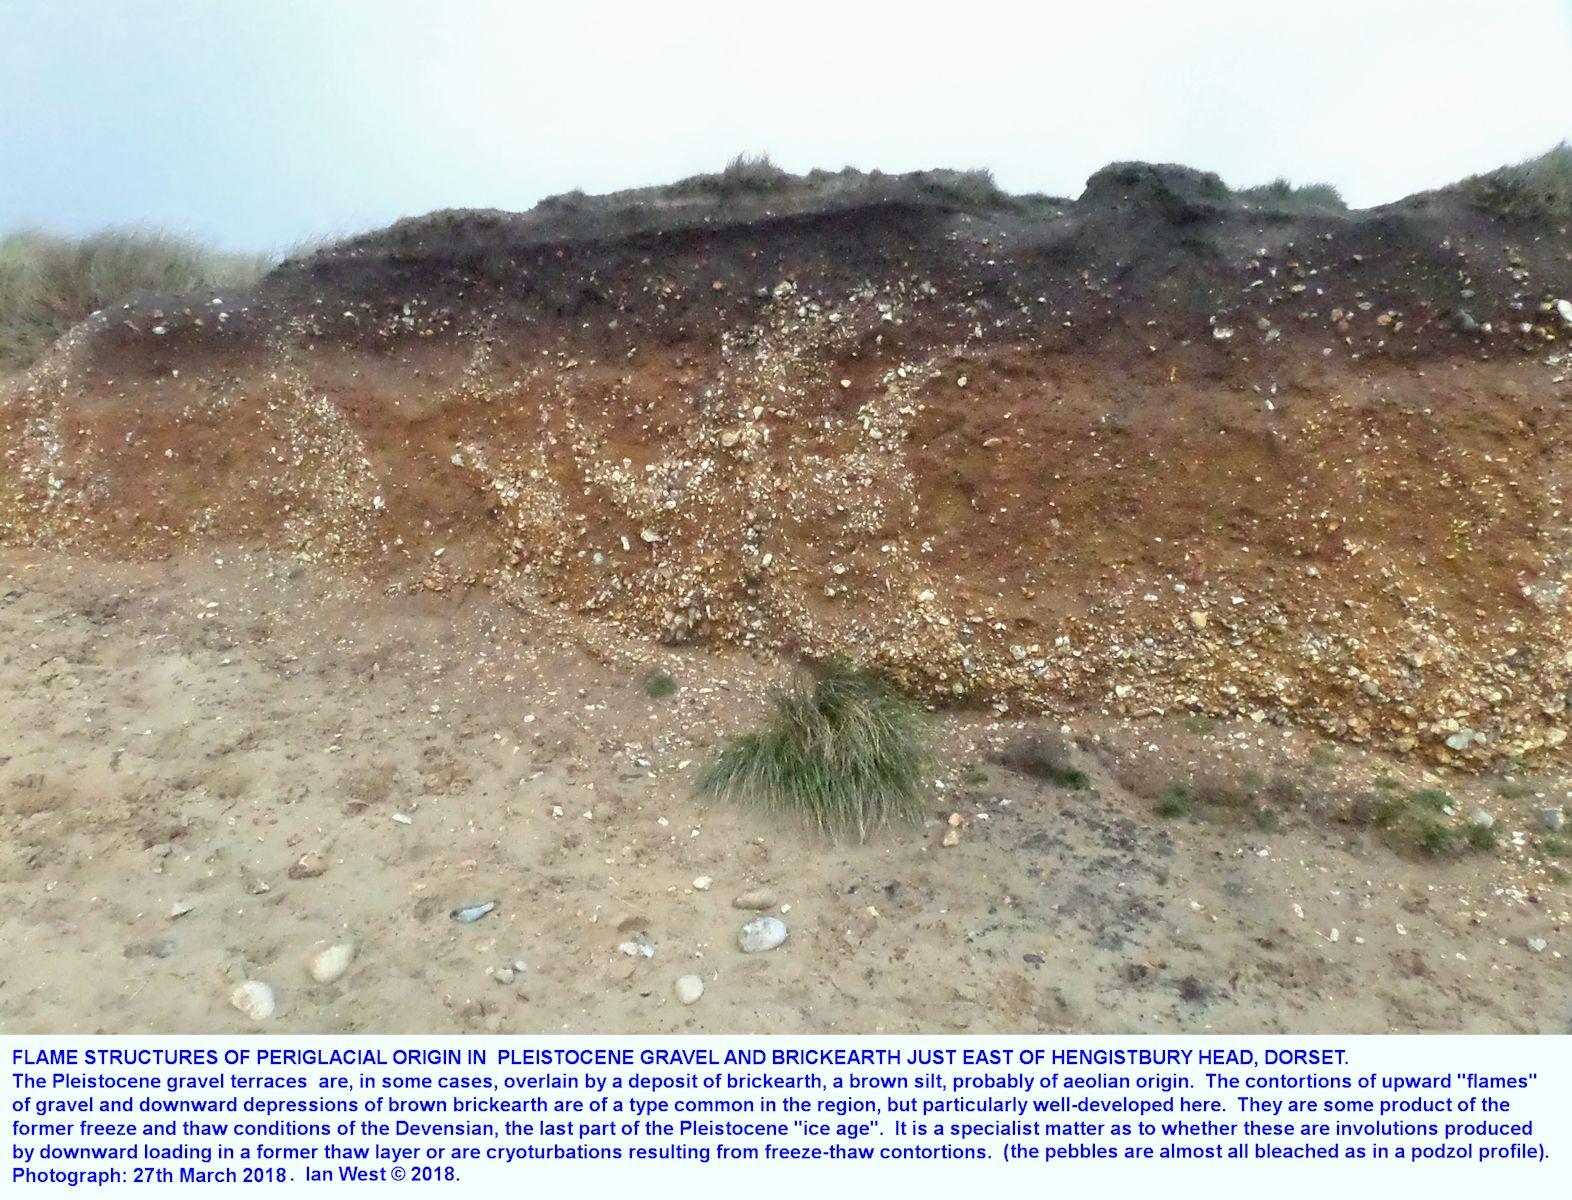 Low-level Pleistocene gravel between Southbourne and Hengistbury Head, Bournemouth, Dorset, March 2018